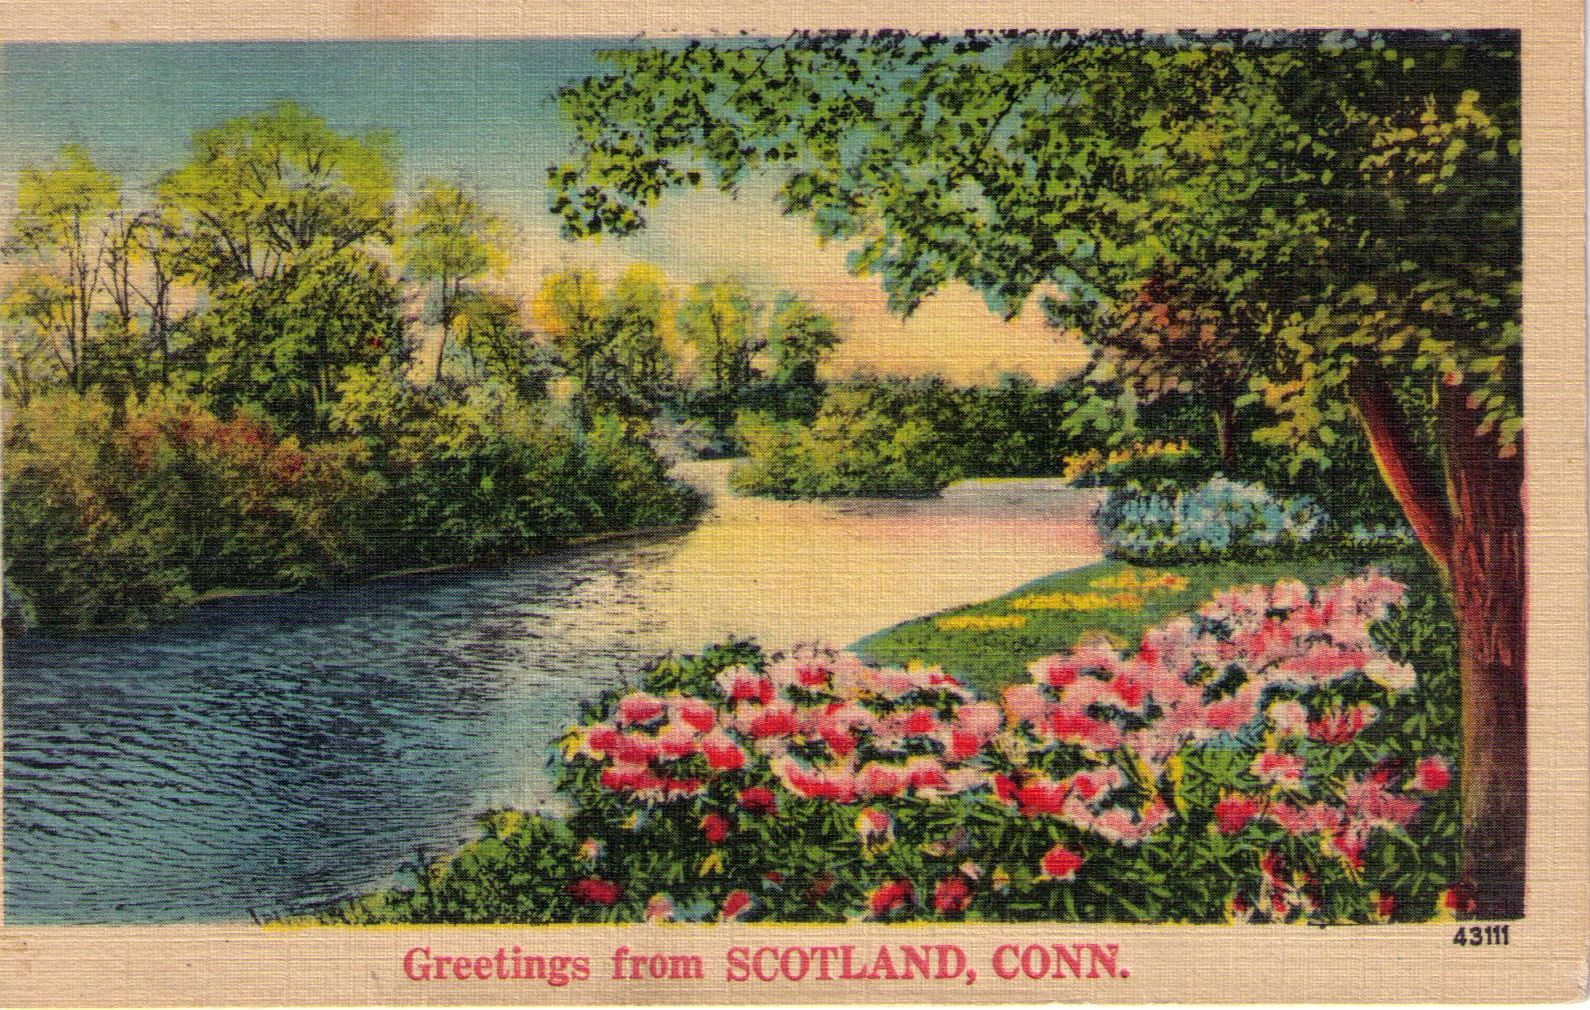 NYCE generic souvenir postcards circa 1940s